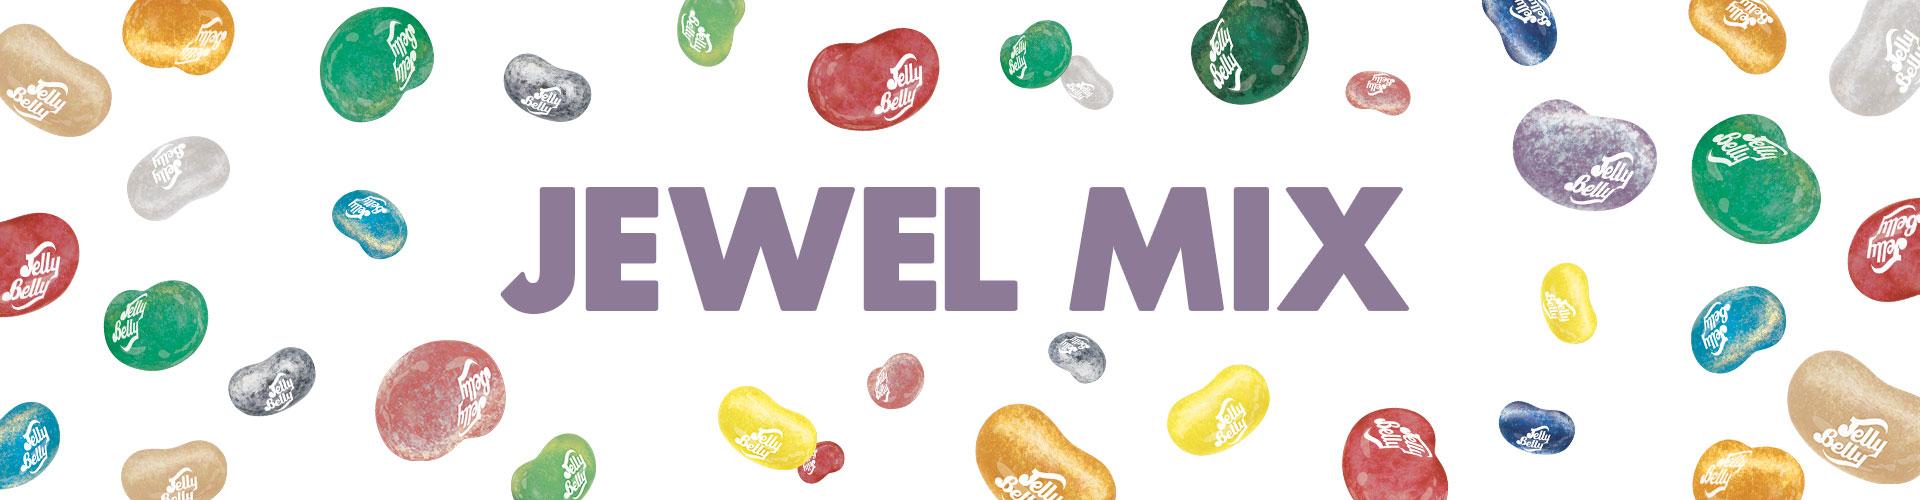 Jewel Jelly Beans